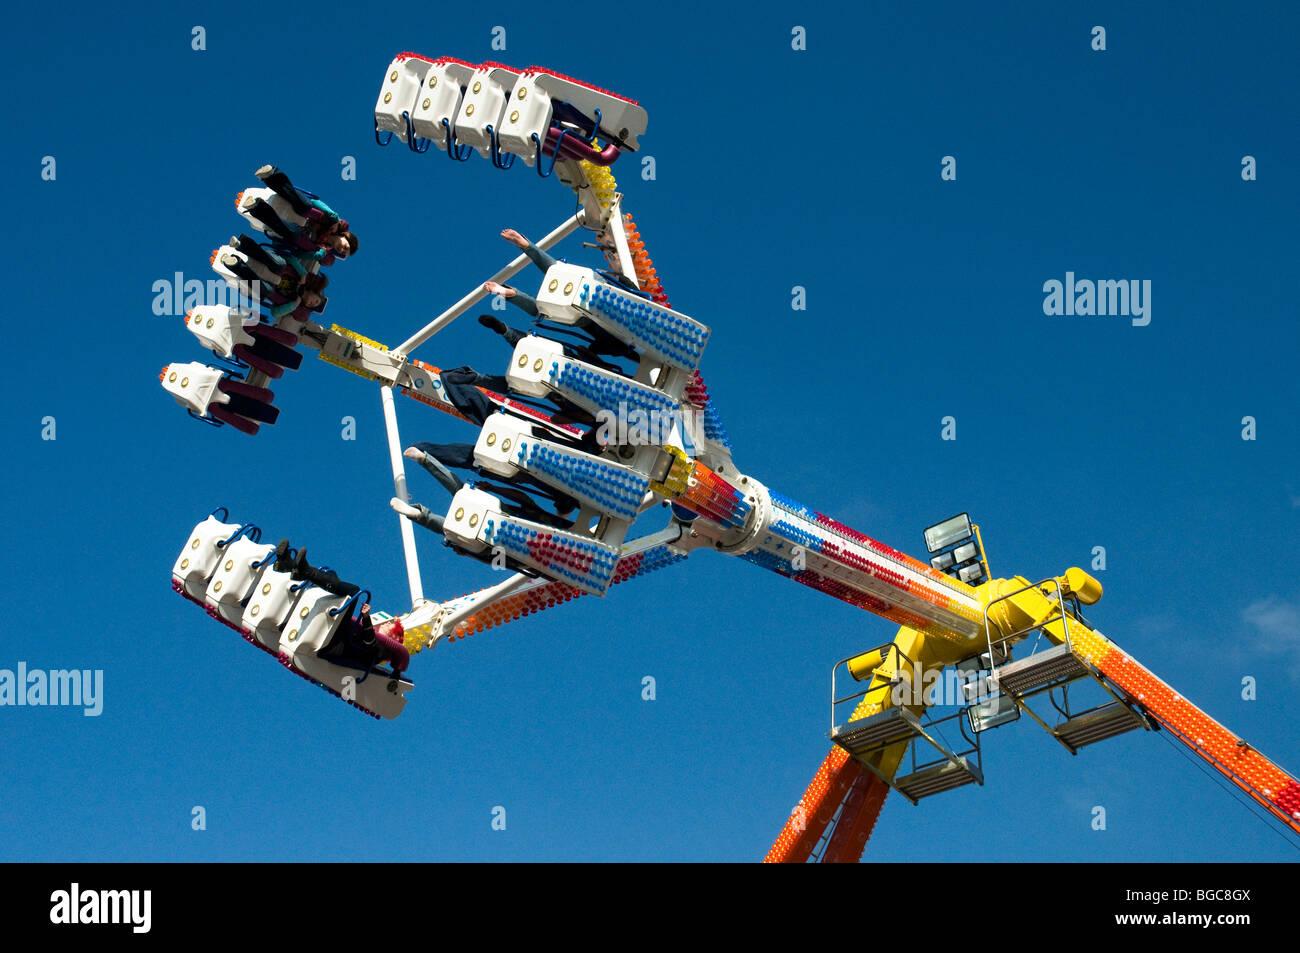 Freak Out fairground ride during pendulum swing , against blue sky , Tavistock Goose Fair , Devon , England - Stock Image